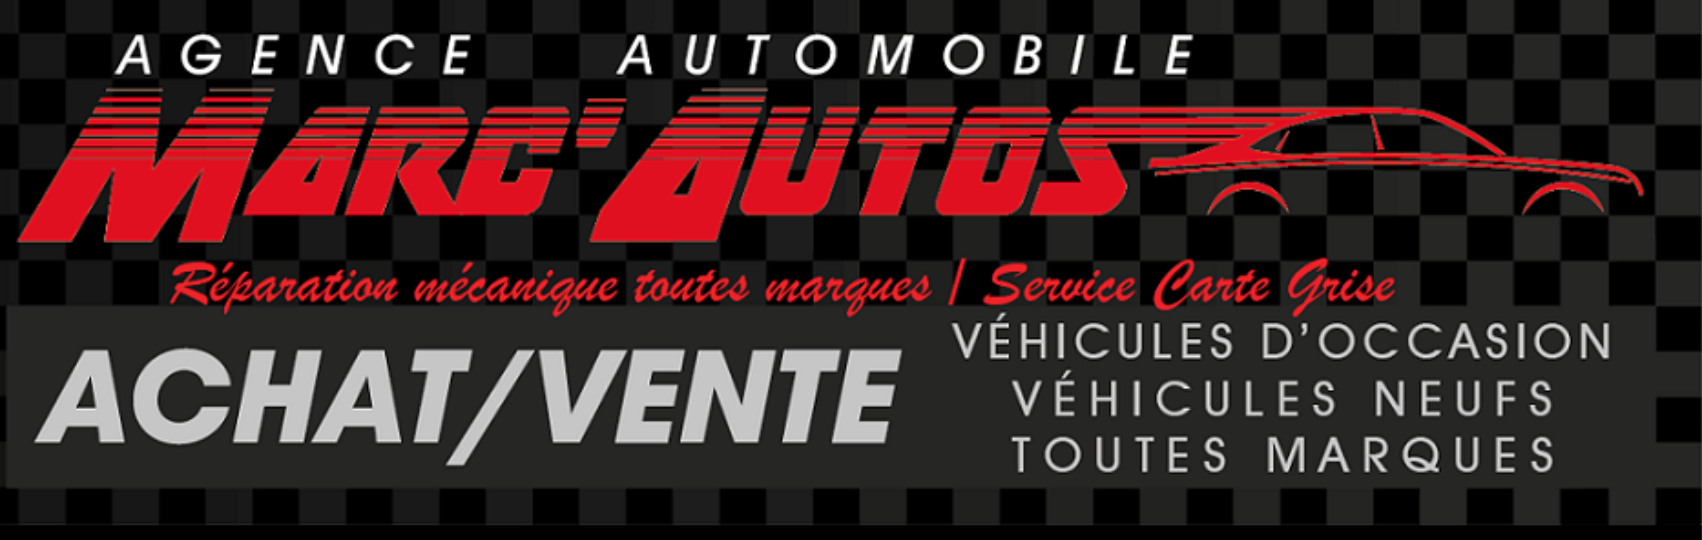 Garage Marc Autos logo